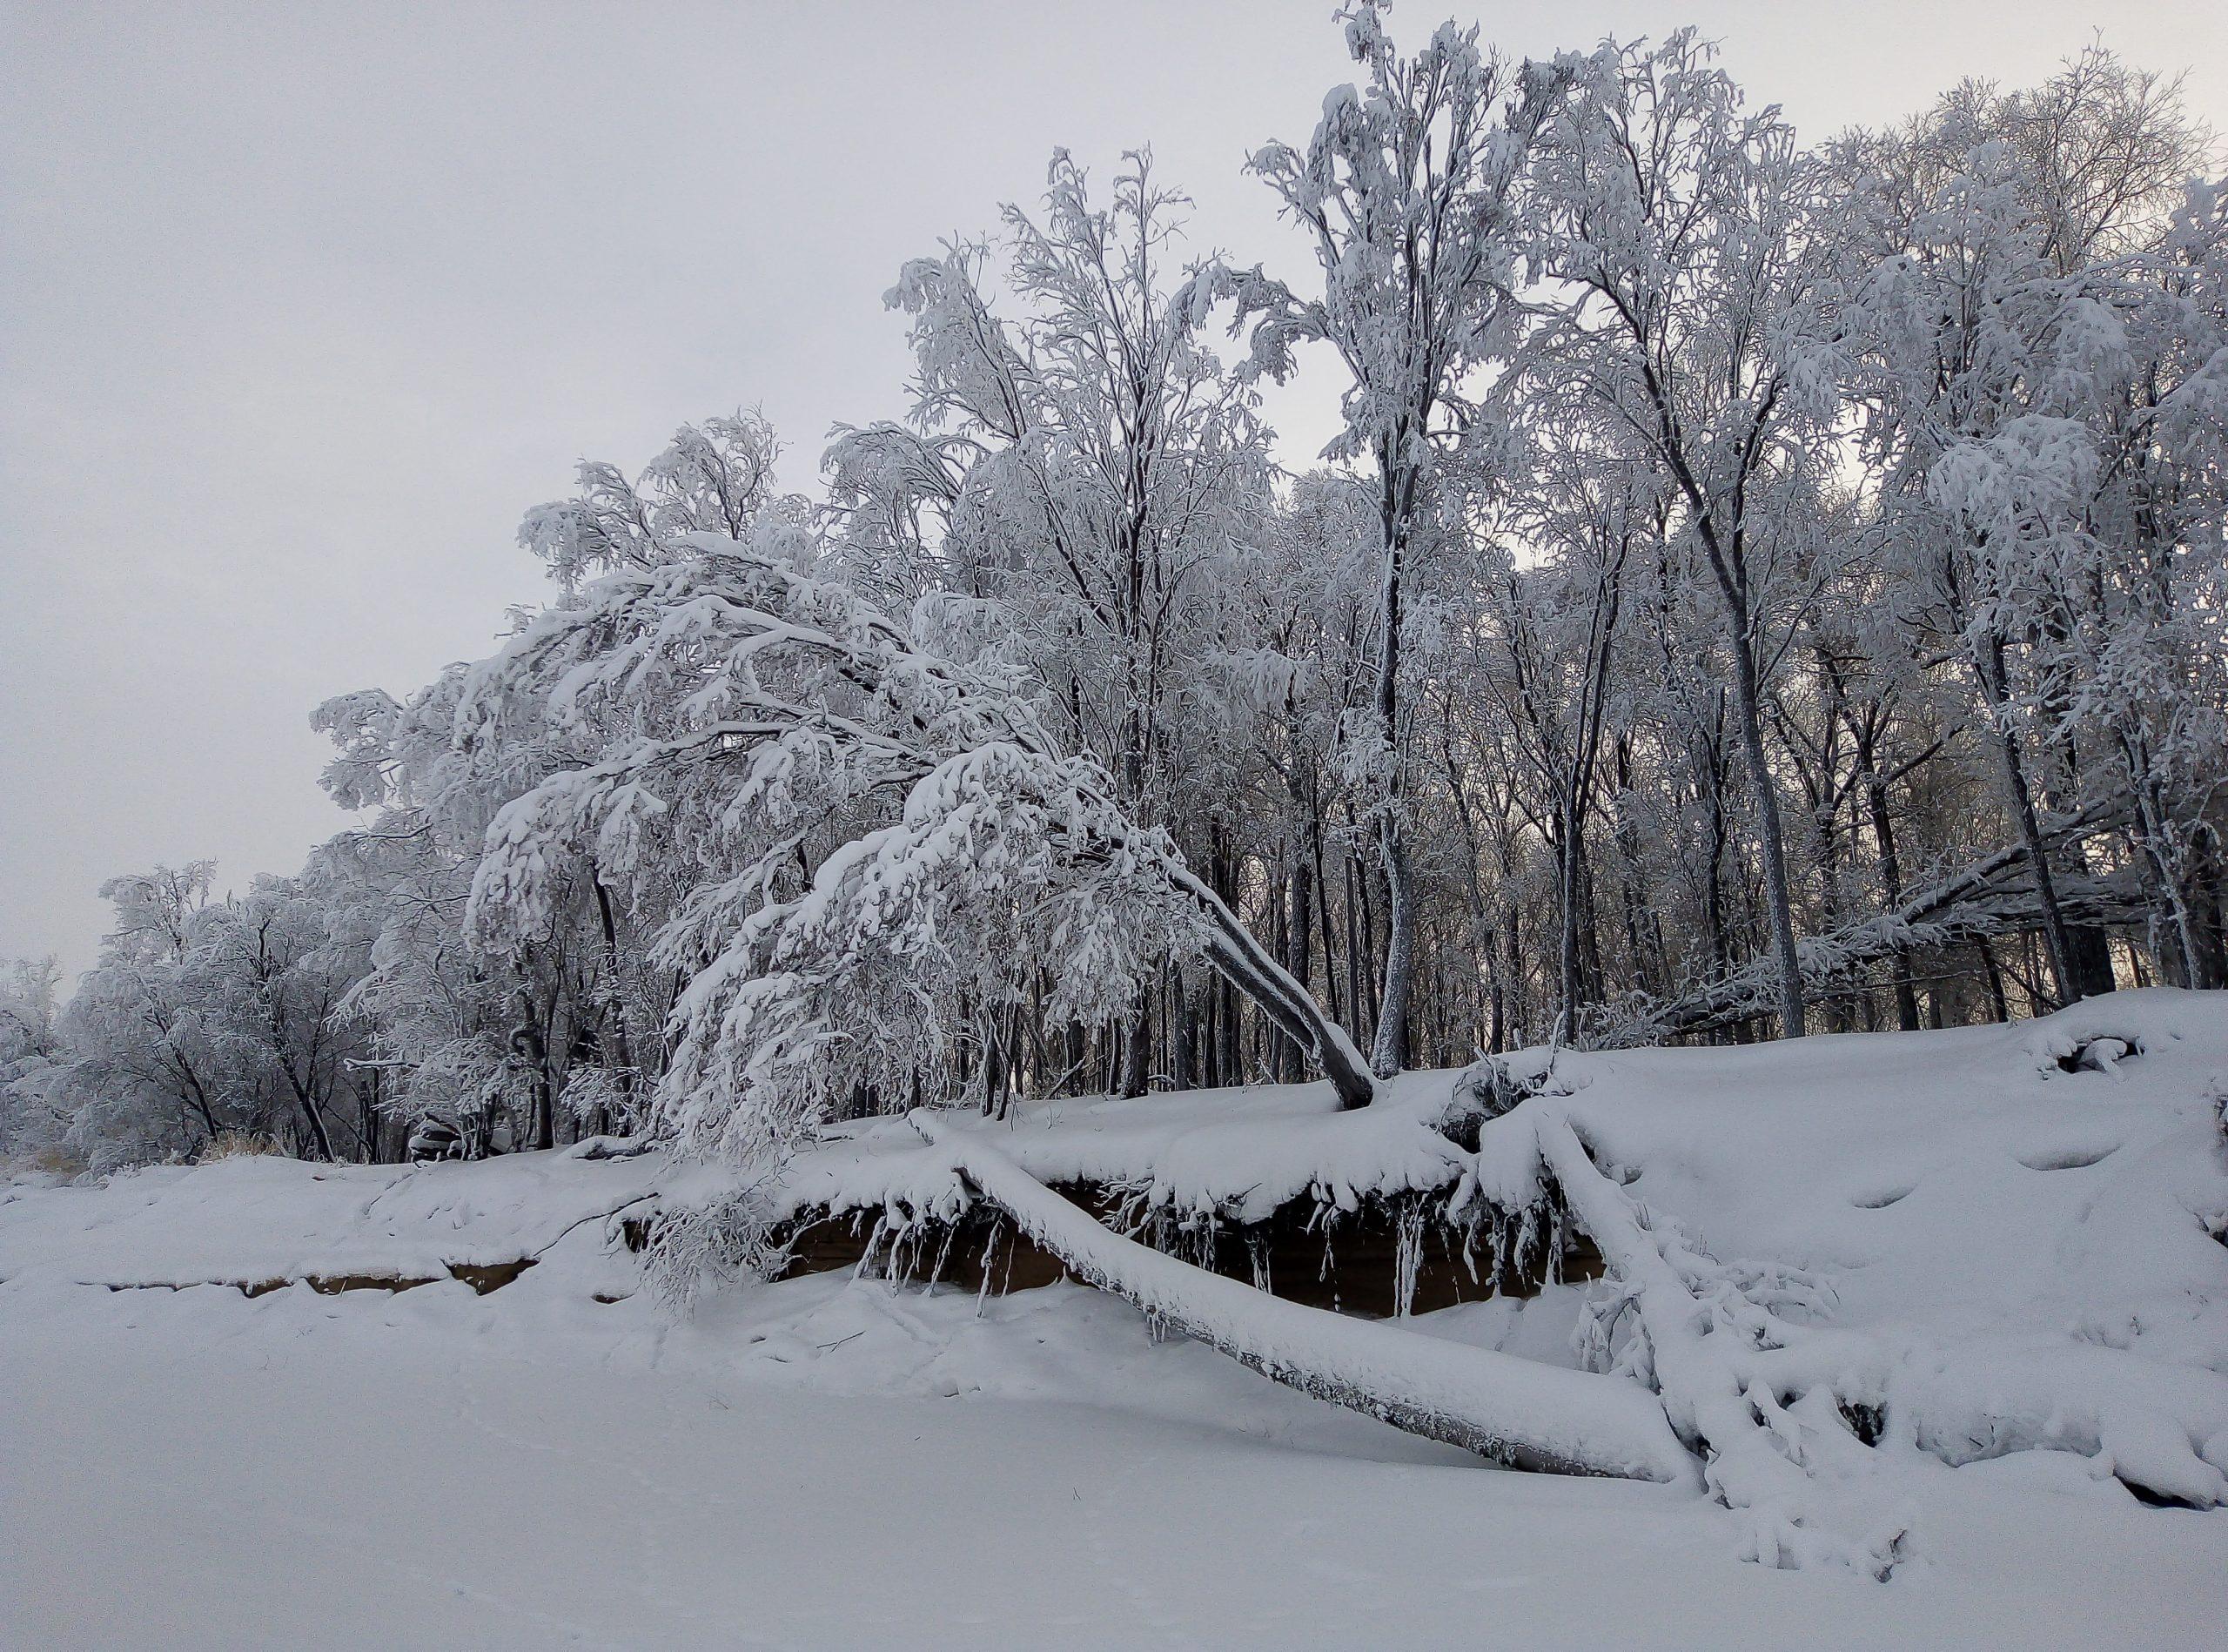 3 МЕСТО 3Дивная зима Целикова Виктория 1 курс дизайн